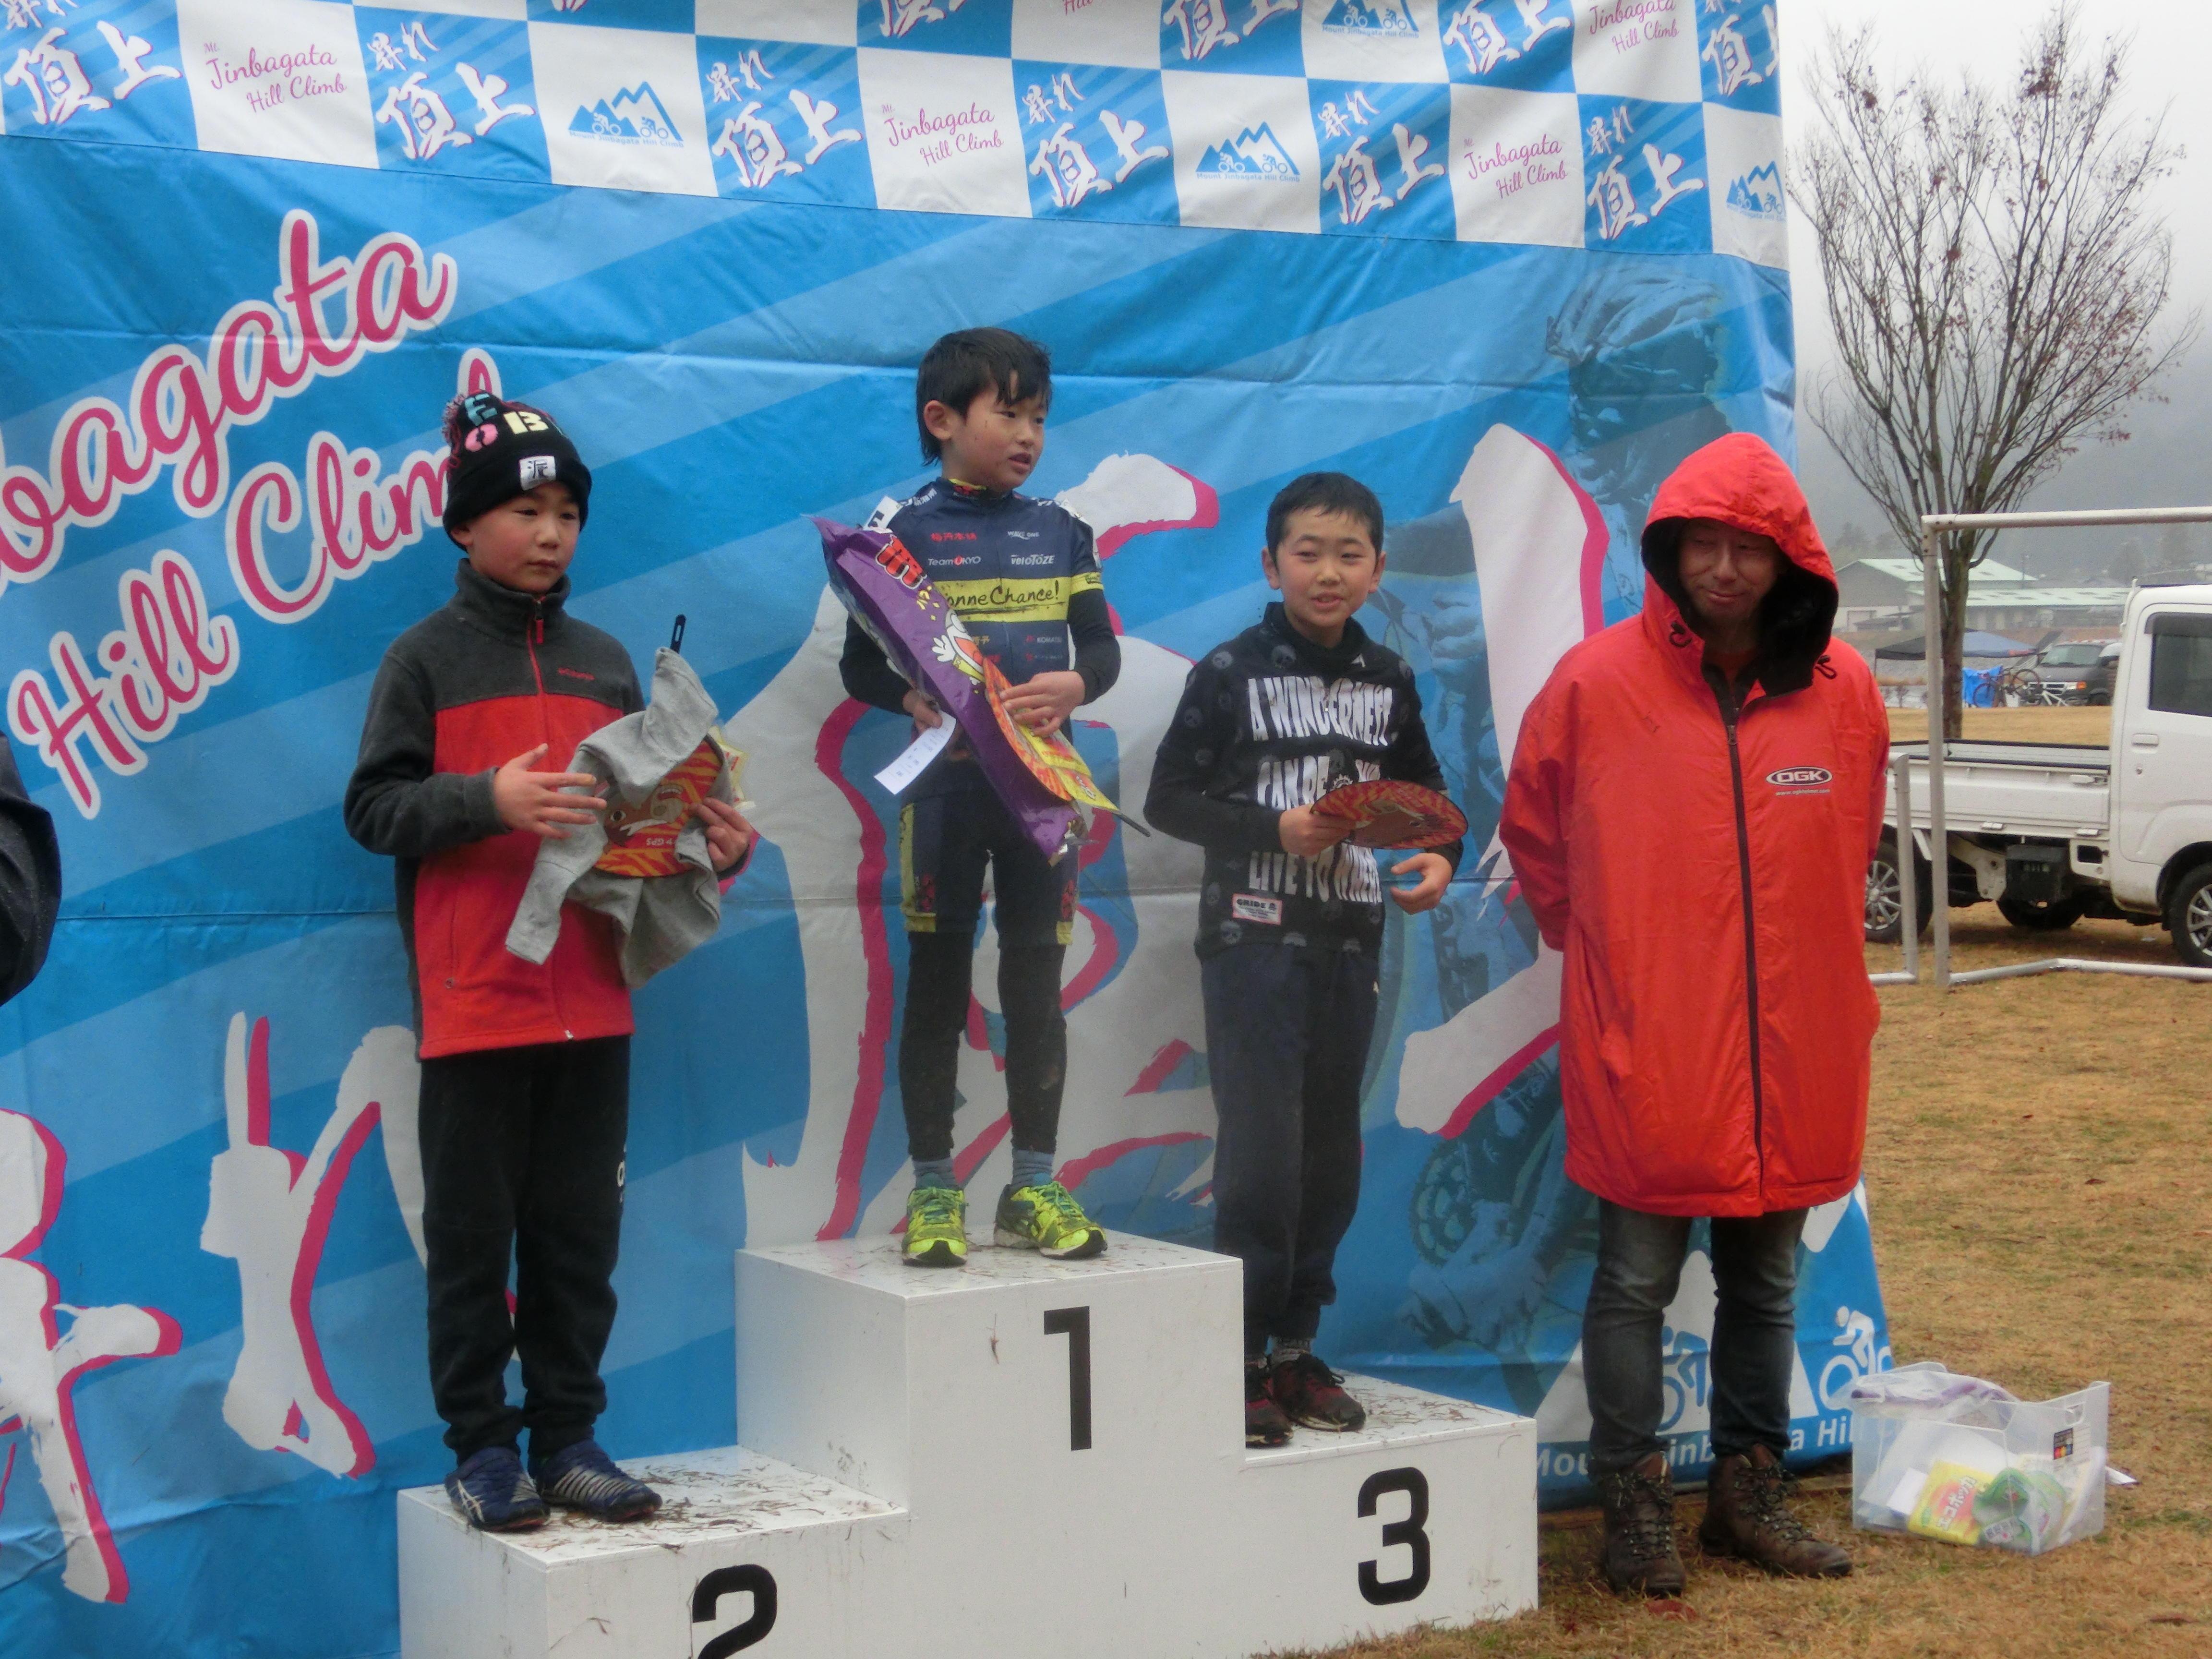 https://www.cyclocross.jp/news/2018_1223CCM188Minamishinsyu0225.JPG